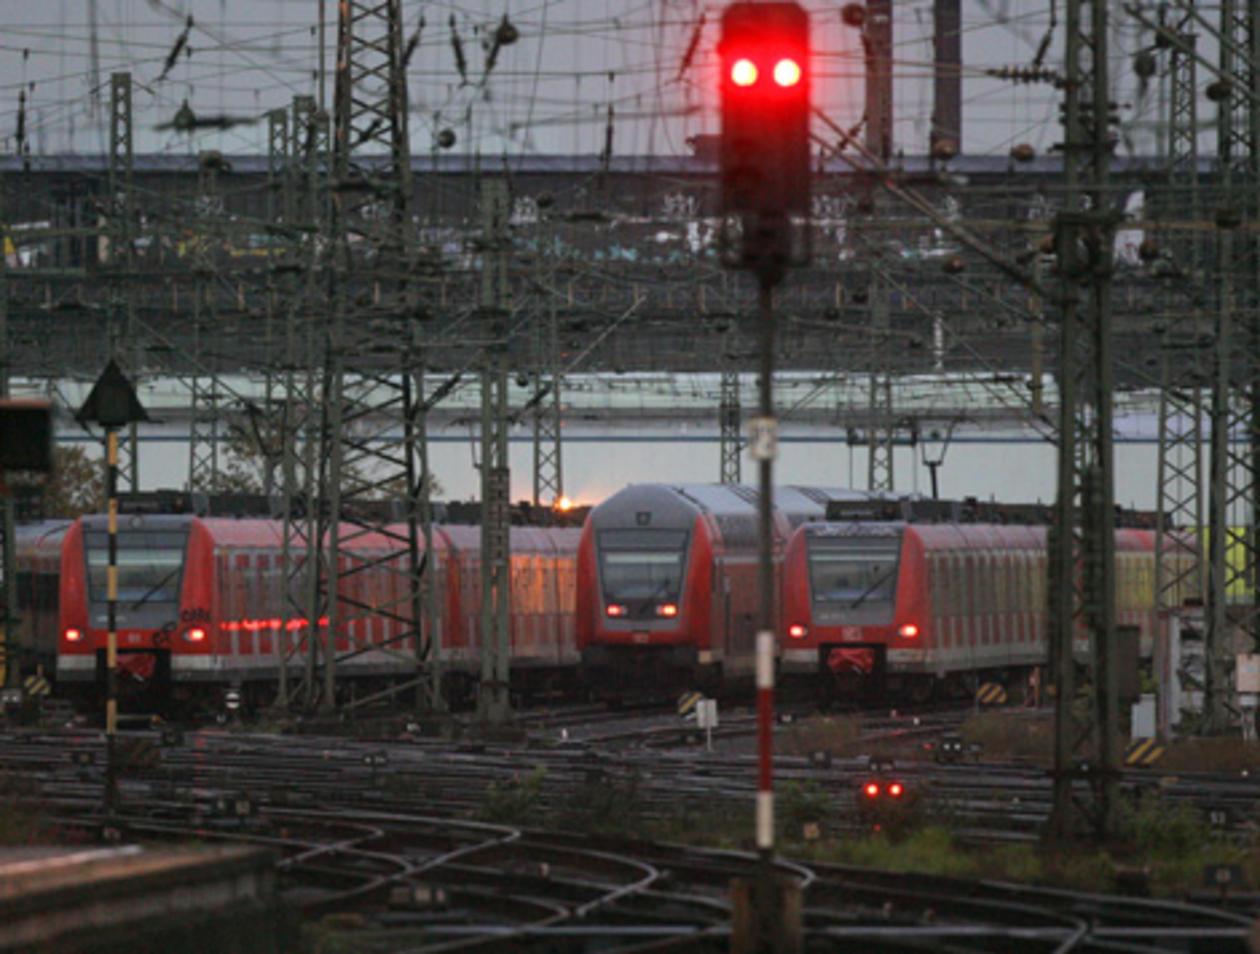 Bahn Sonderzüge Zum Oktoberfest Verkehrsmittel